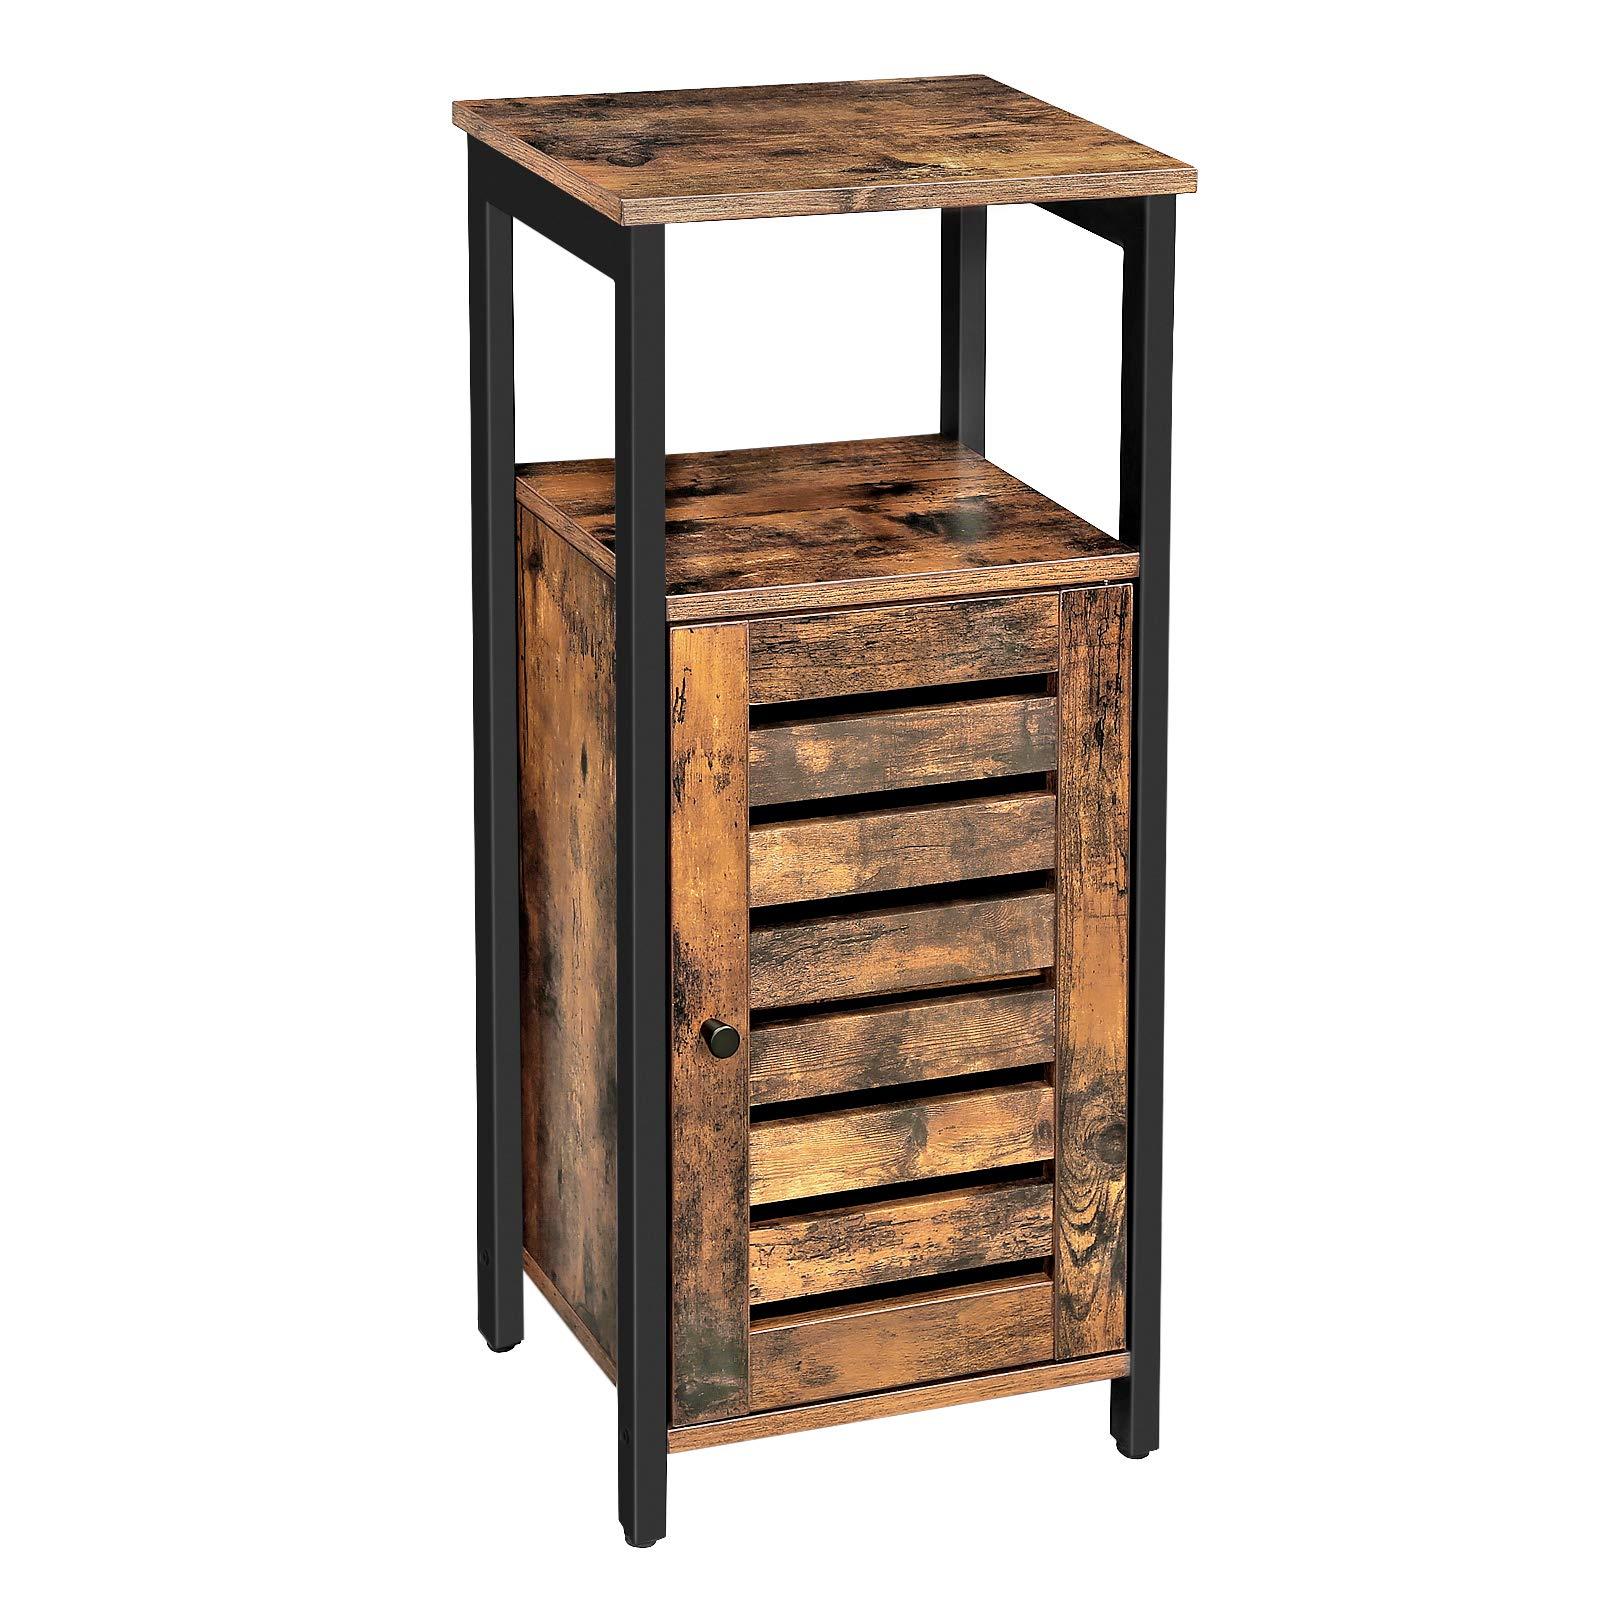 VASAGLE Storage Cabinet, Standing Cabinet, Industrial Side Cabinet, Beside Cupboard with Shelf, for Living Room, Bedroom, Hallway, 37 x 30 x 81 cm, Rustic Brown LSC34BX